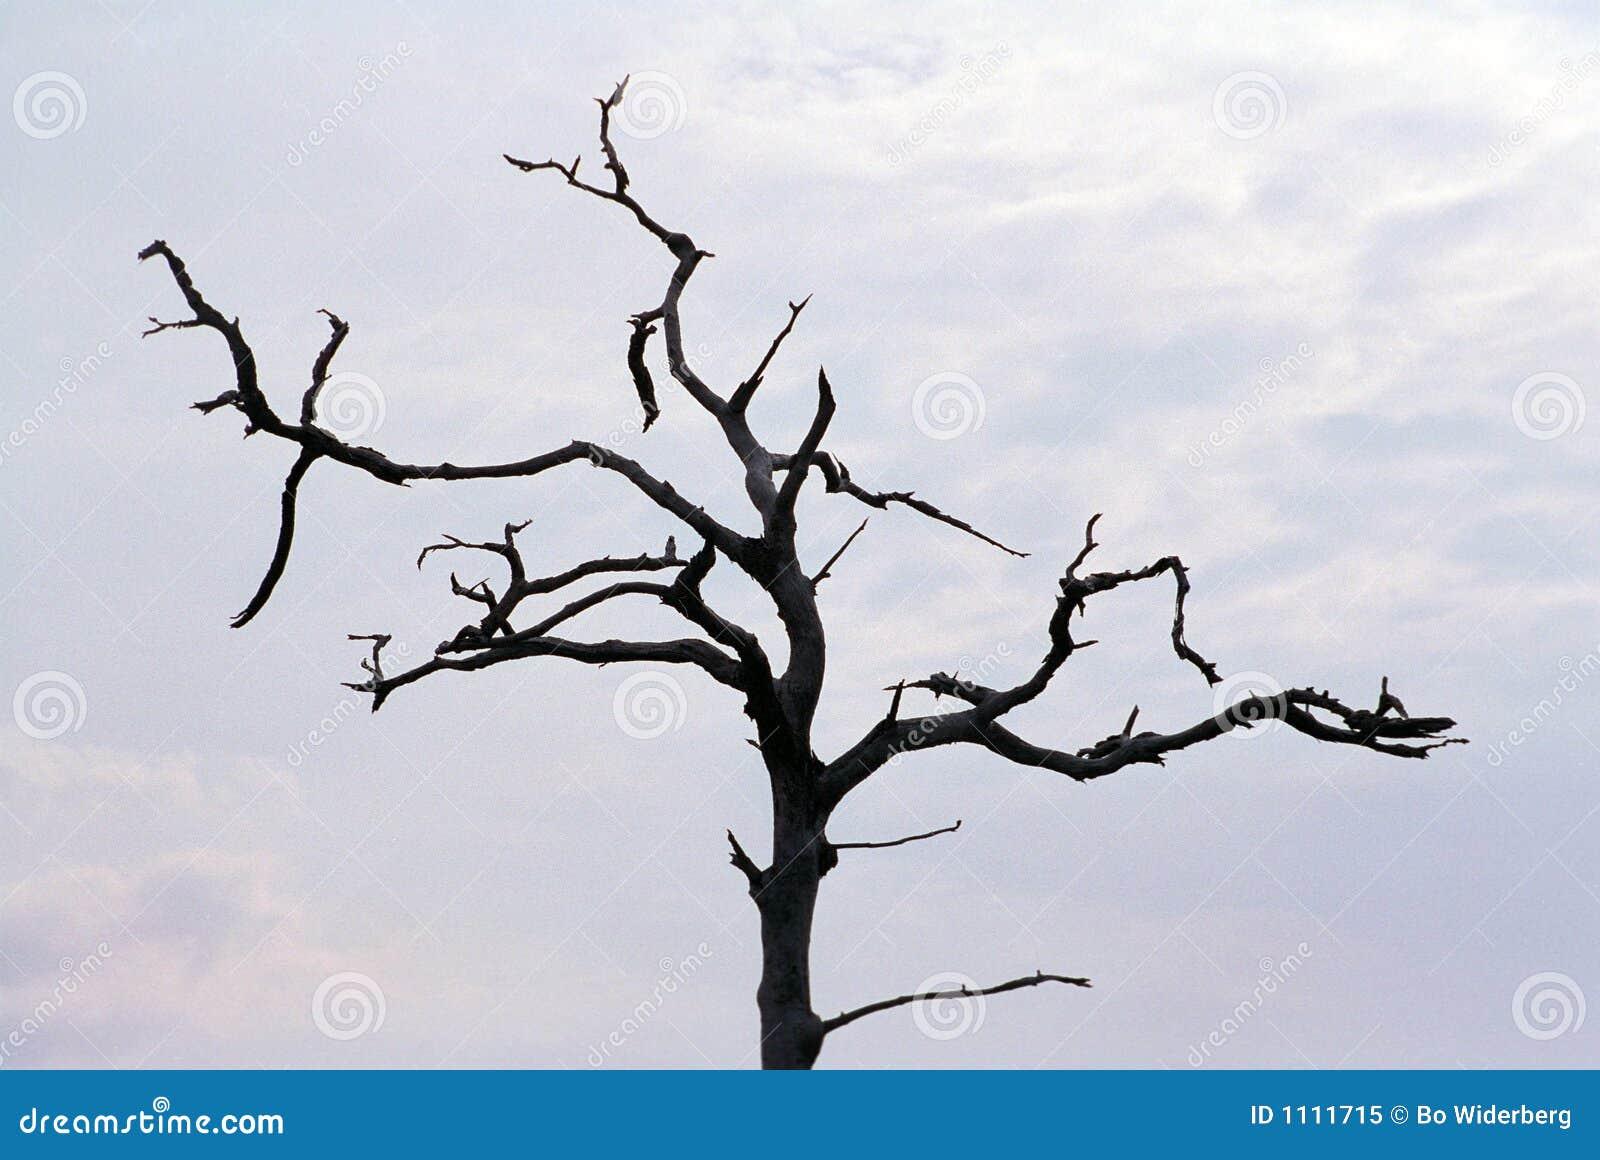 steifer toter baum gegen grauen himmel stockbild bild von baum steif 1111715. Black Bedroom Furniture Sets. Home Design Ideas